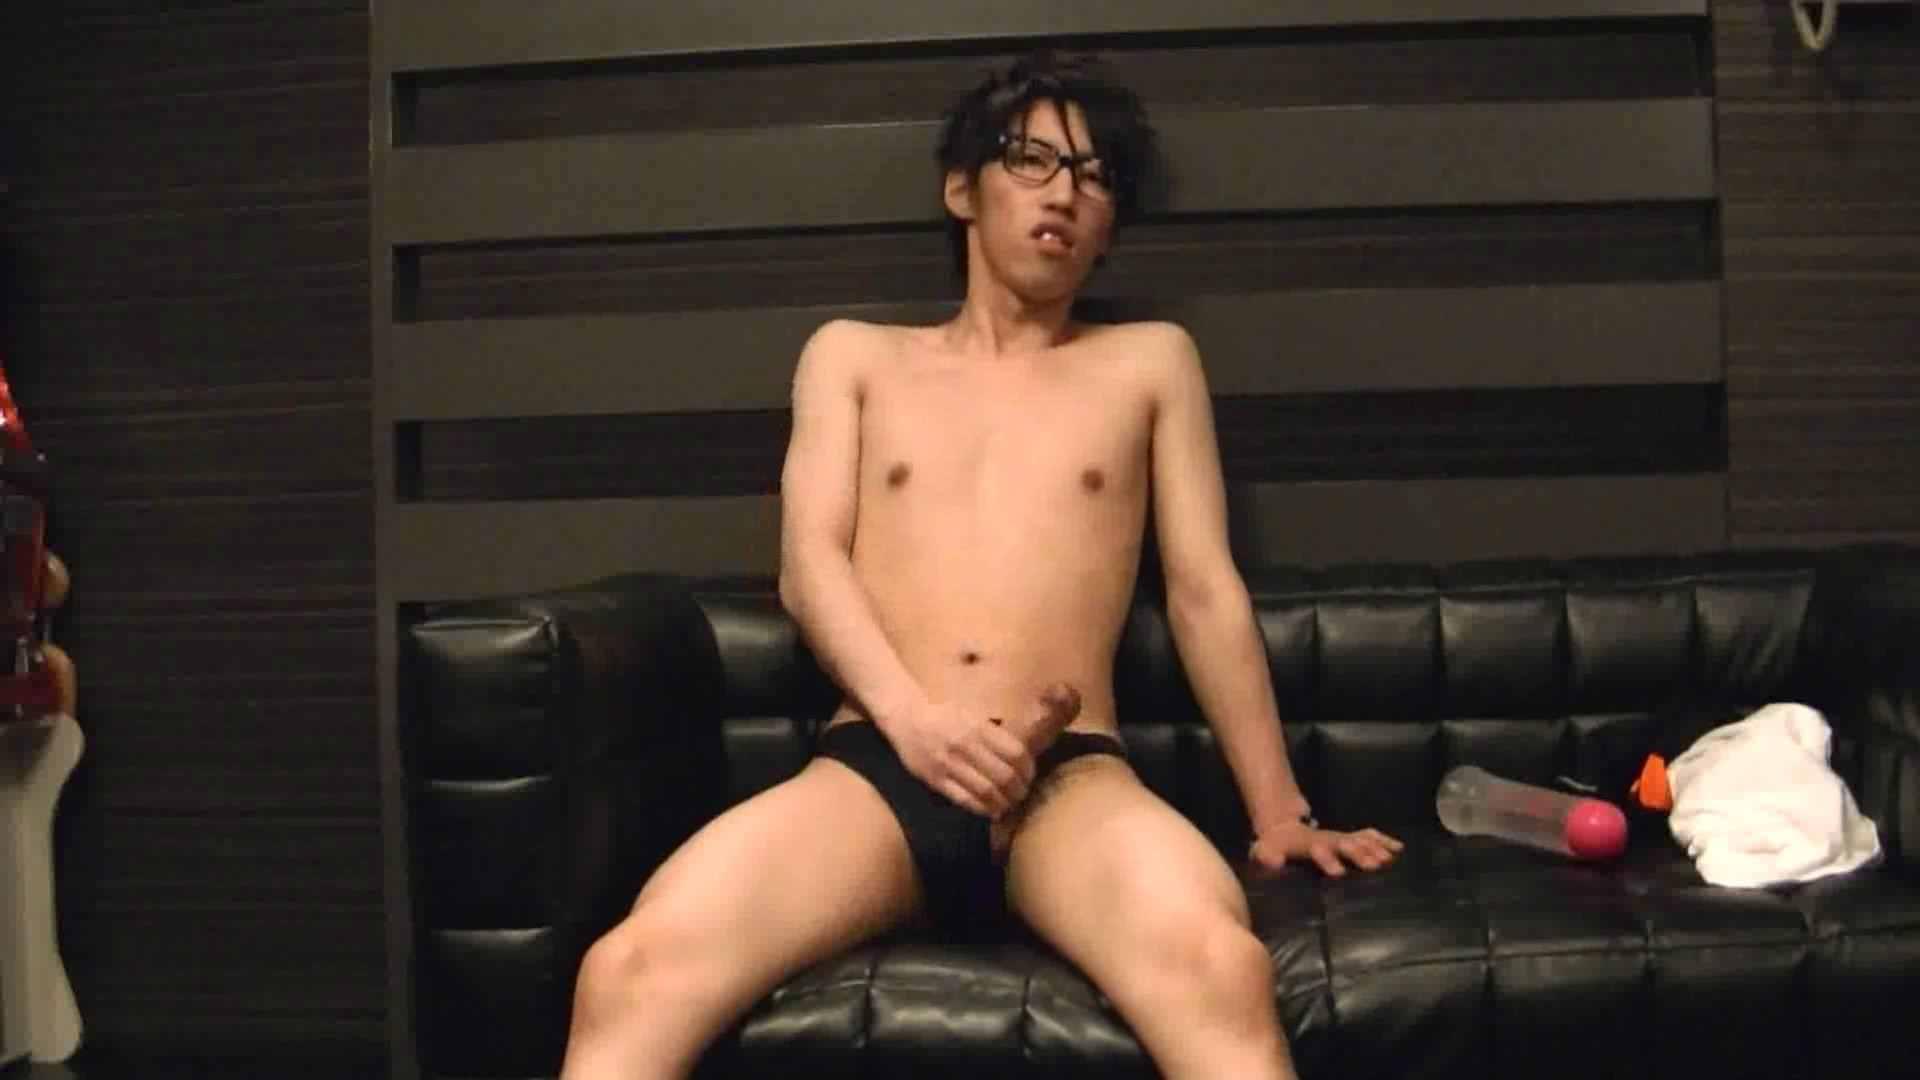 ONA見せカーニバル!! Vol3 男  93pic 51